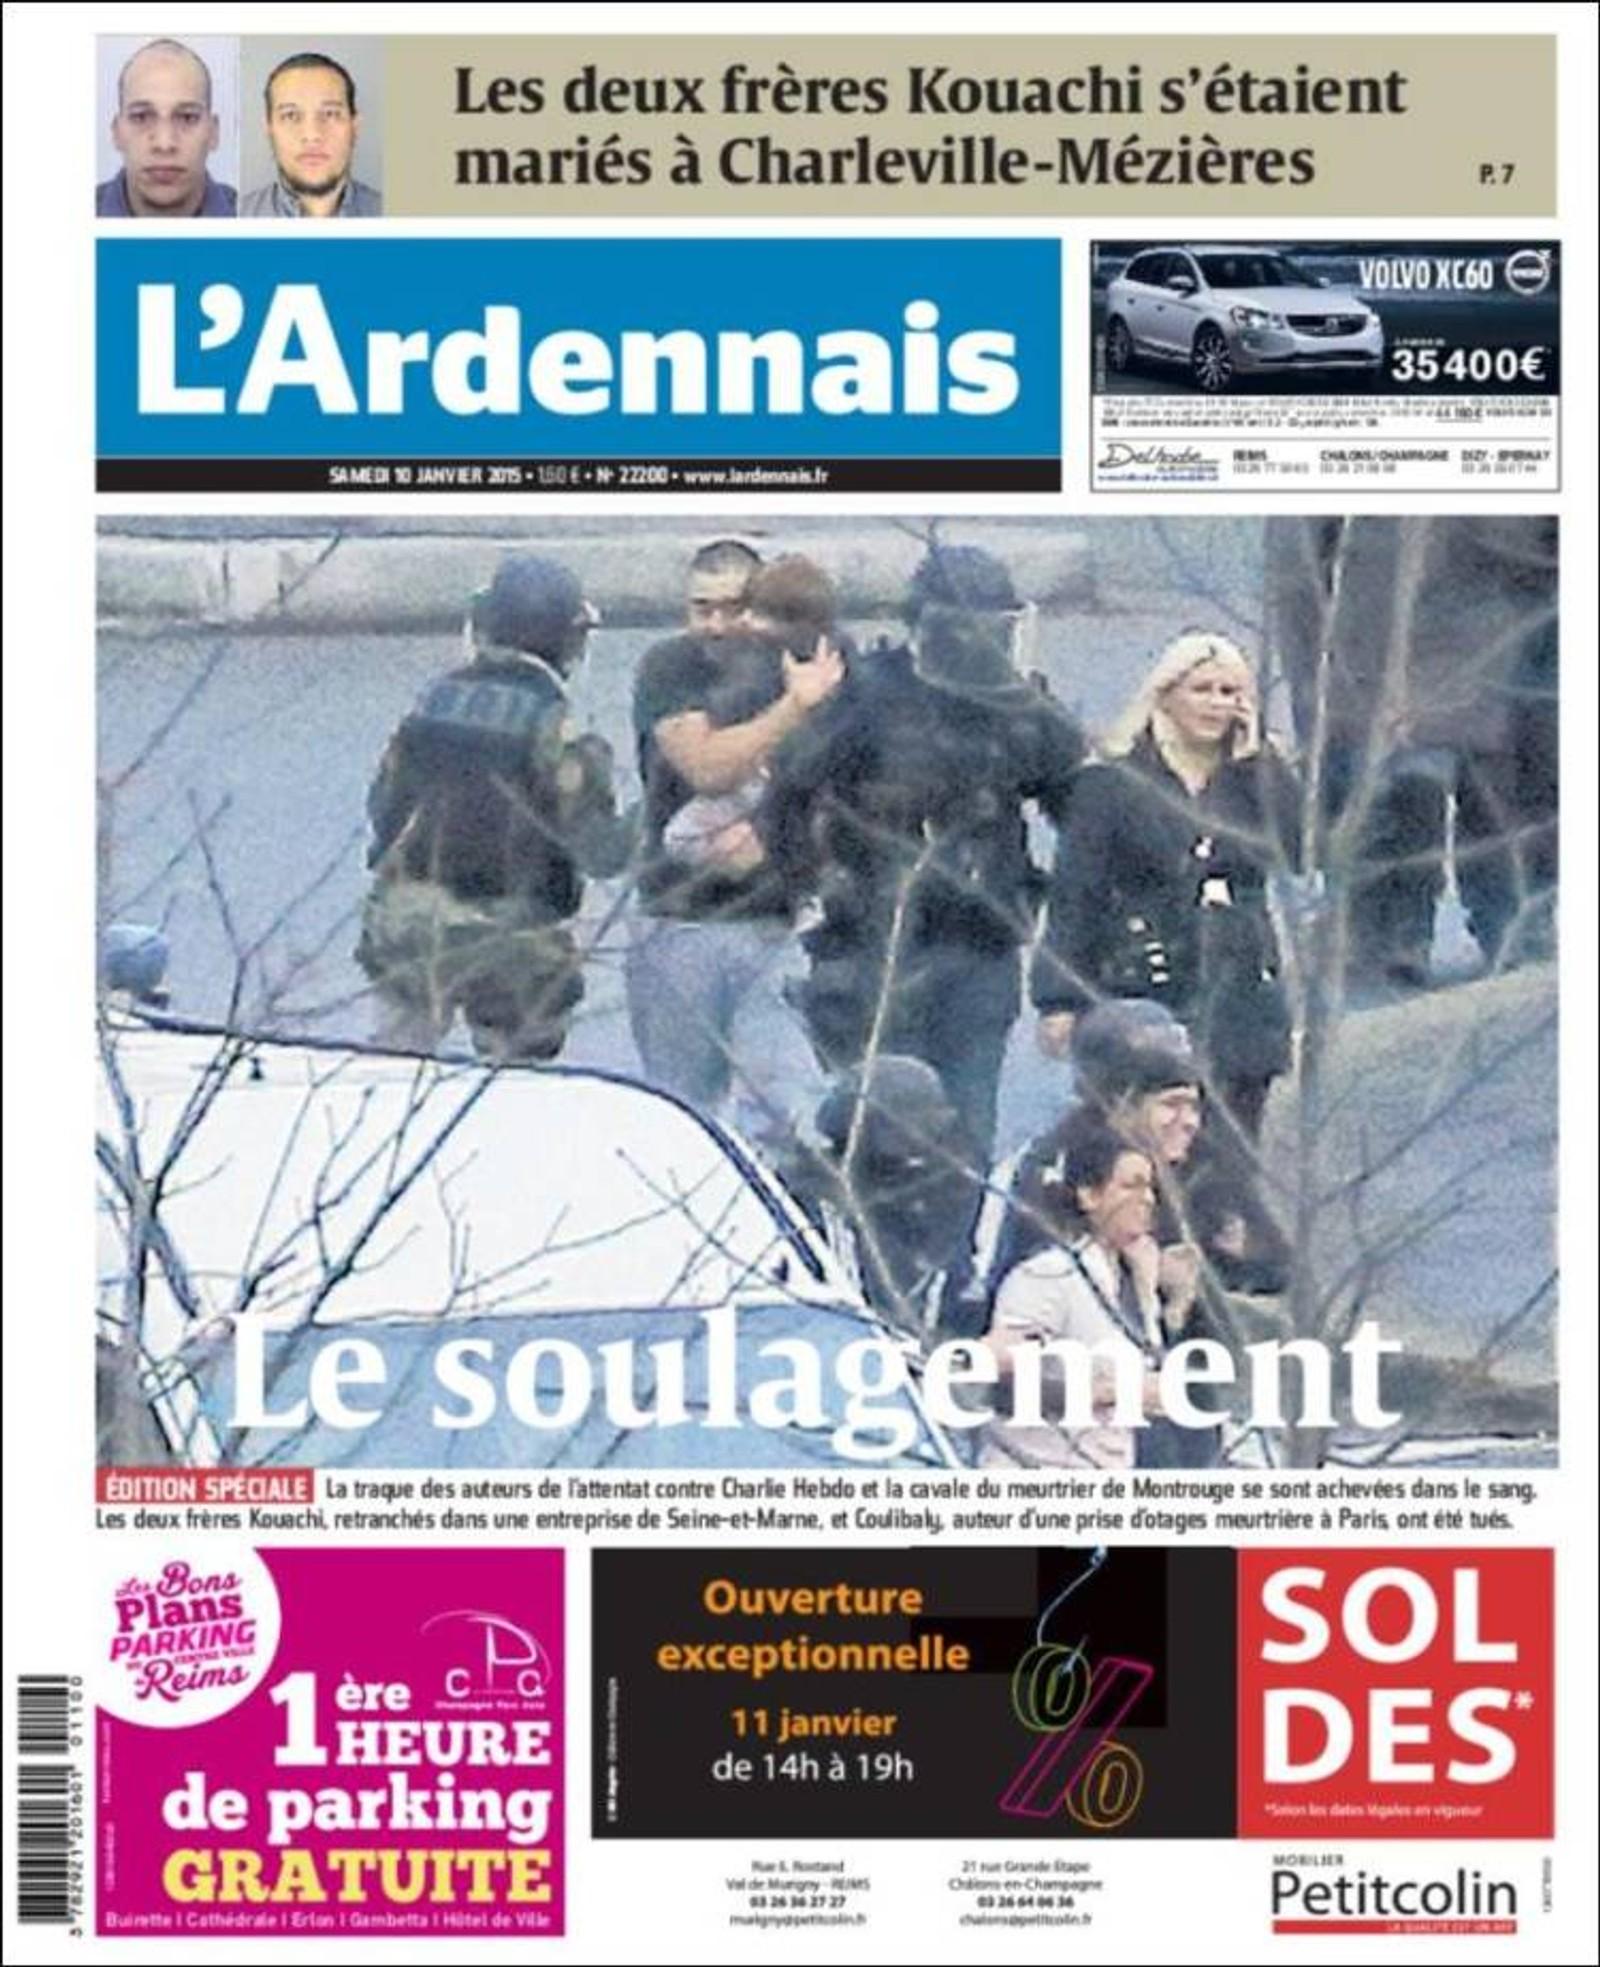 L'Ardennais: Lettelsen.